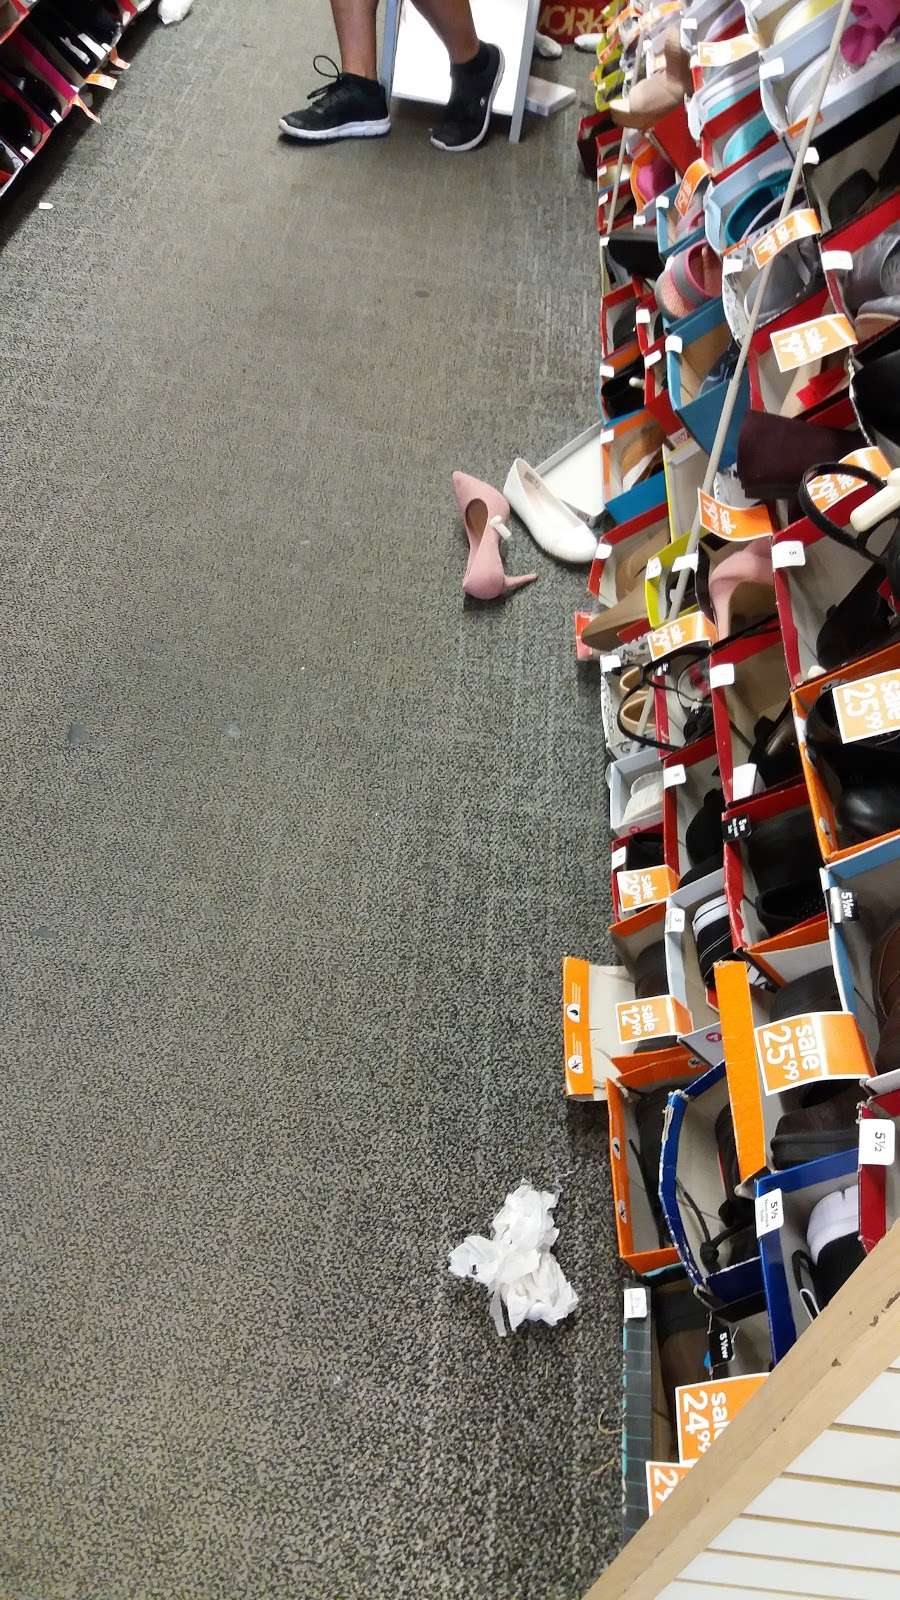 Payless ShoeSource - shoe store  | Photo 1 of 5 | Address: 2260 Bartow Ave, Bronx, NY 10475, USA | Phone: (718) 379-5894